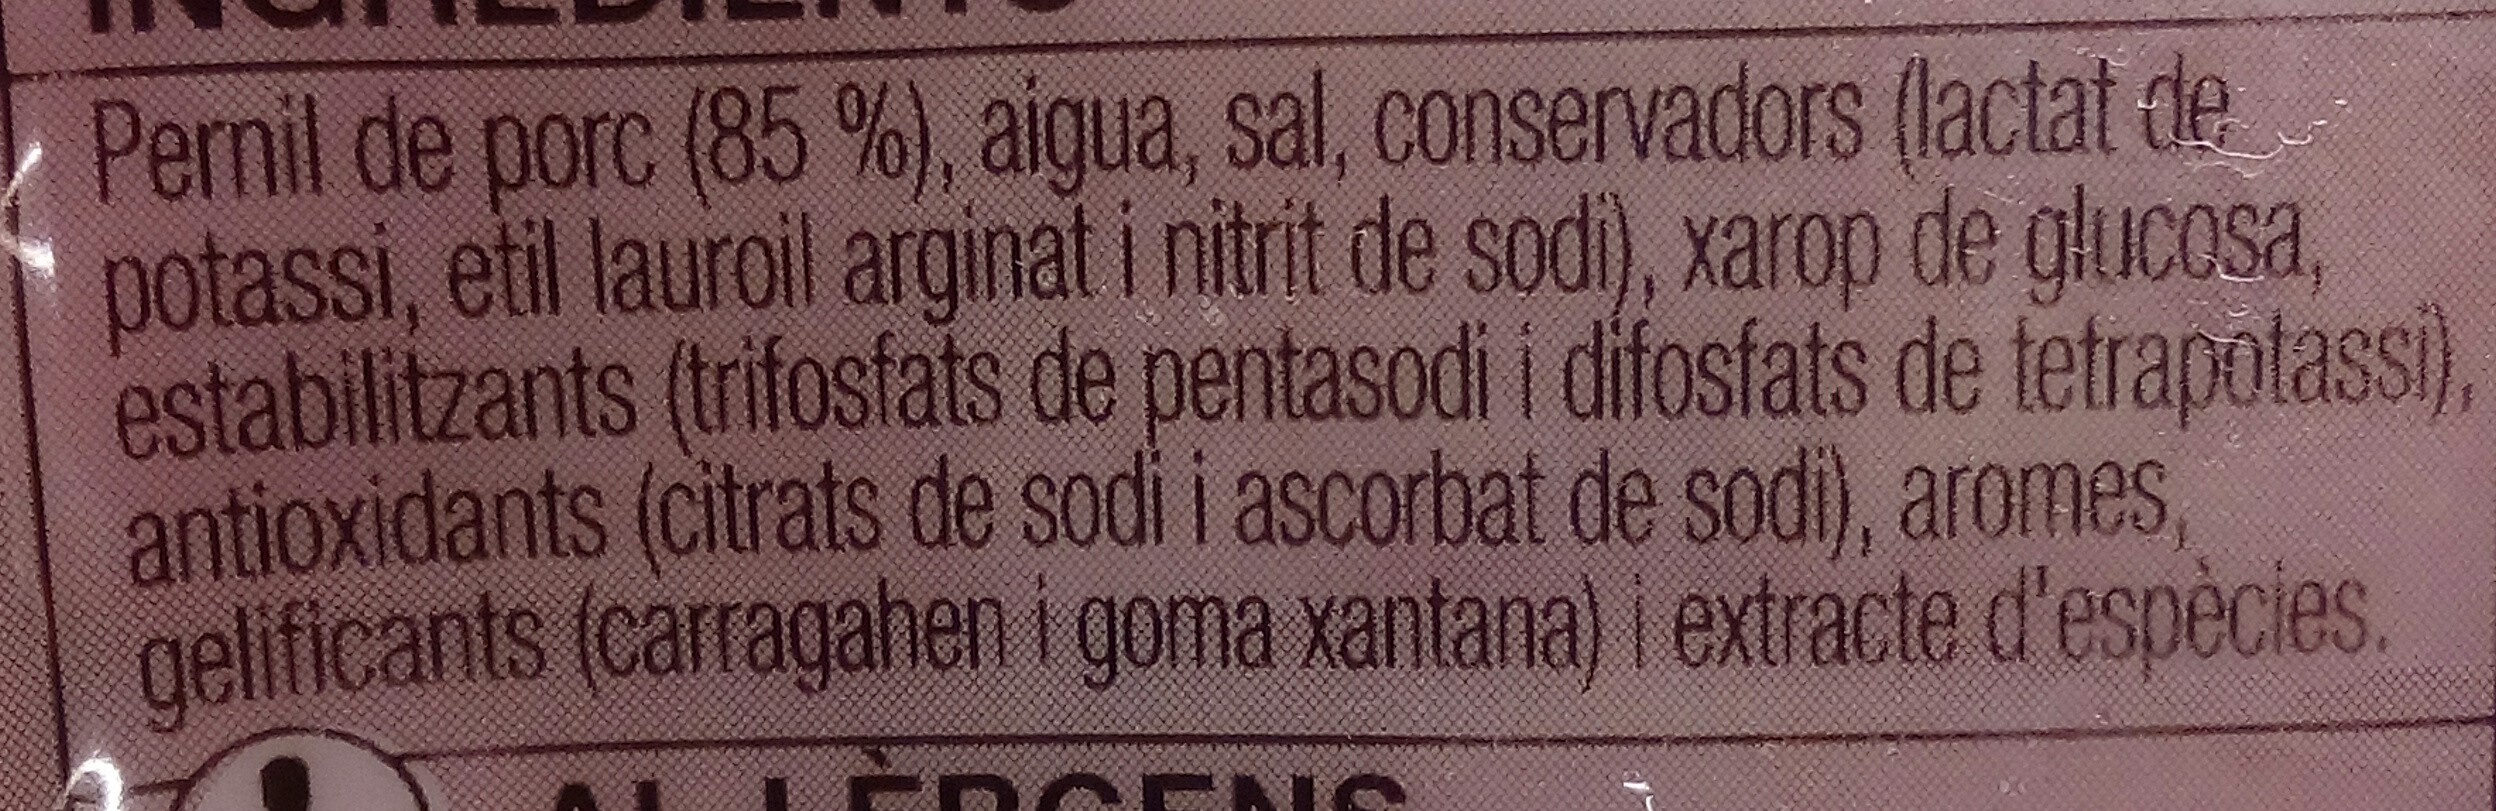 Pernil cuit extra - Ingredients - ca